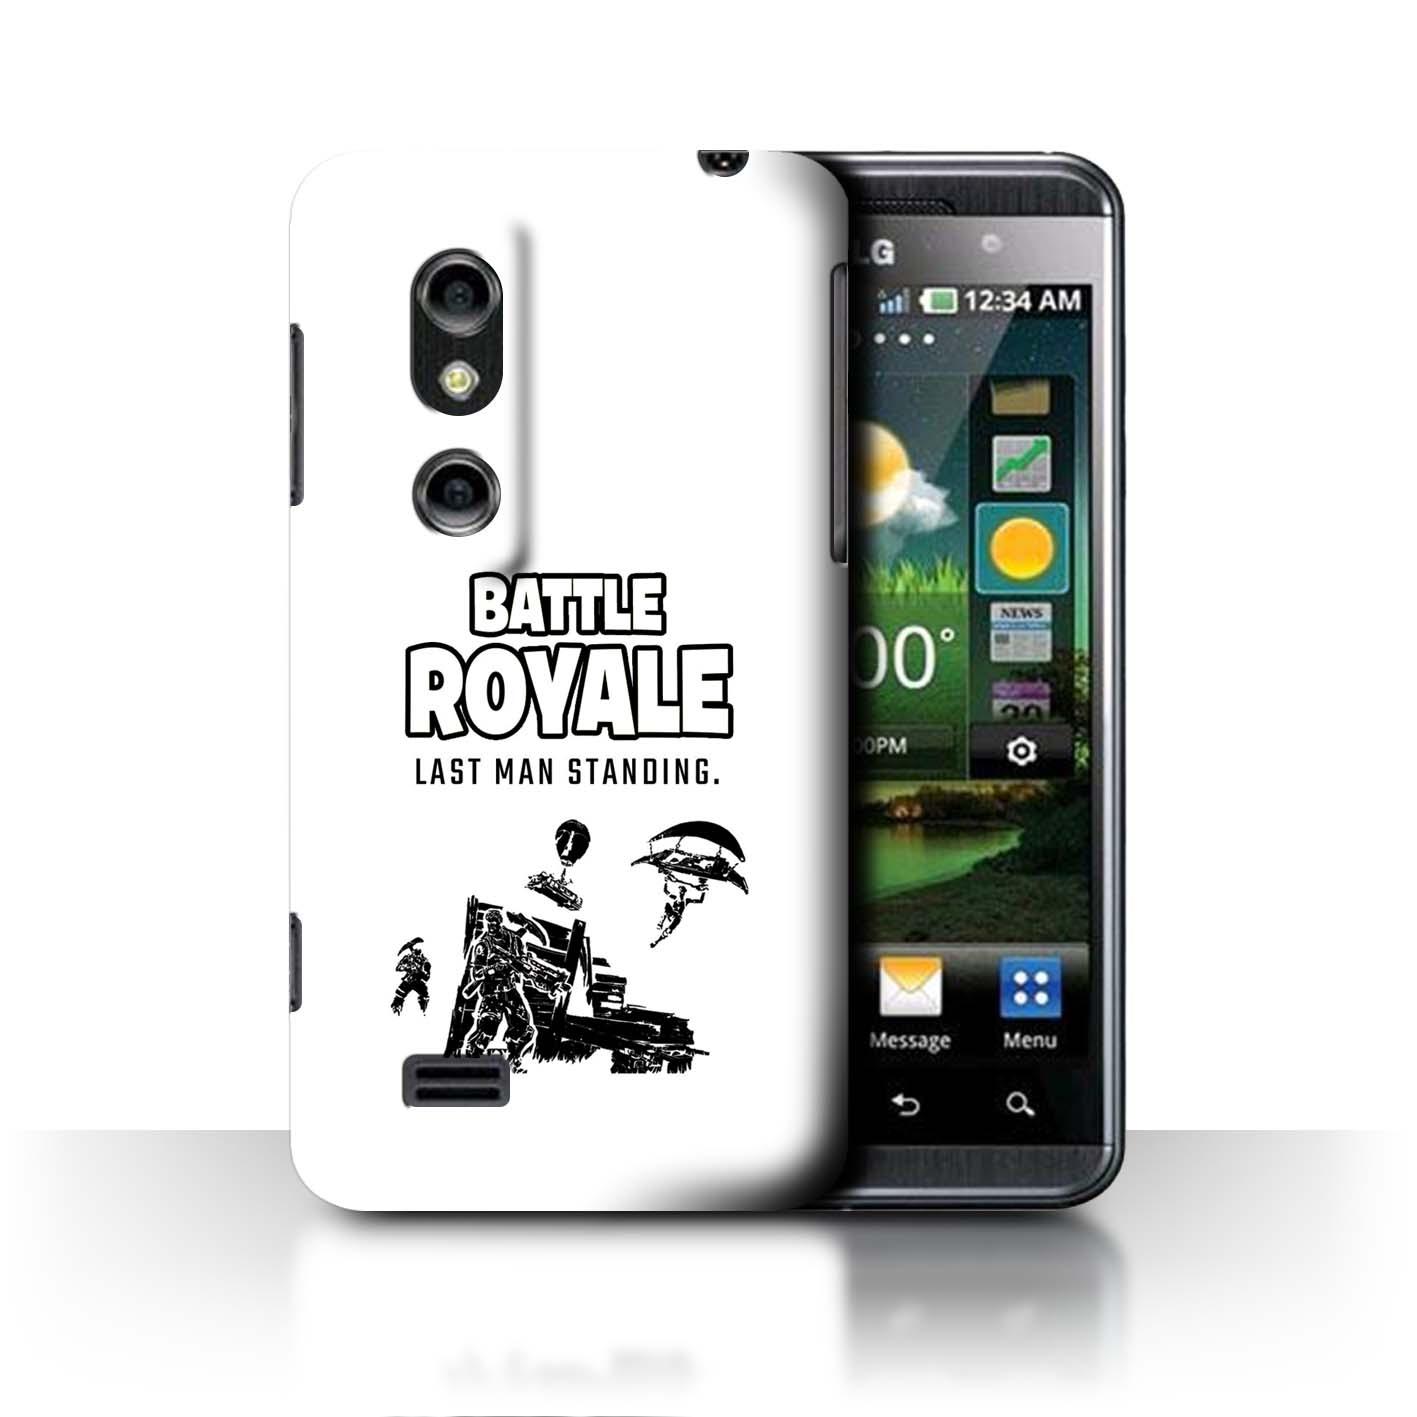 STUFF4-Phone-Case-Back-Cover-for-LG-Optimus-3D-P920-FN-Battle-Royale